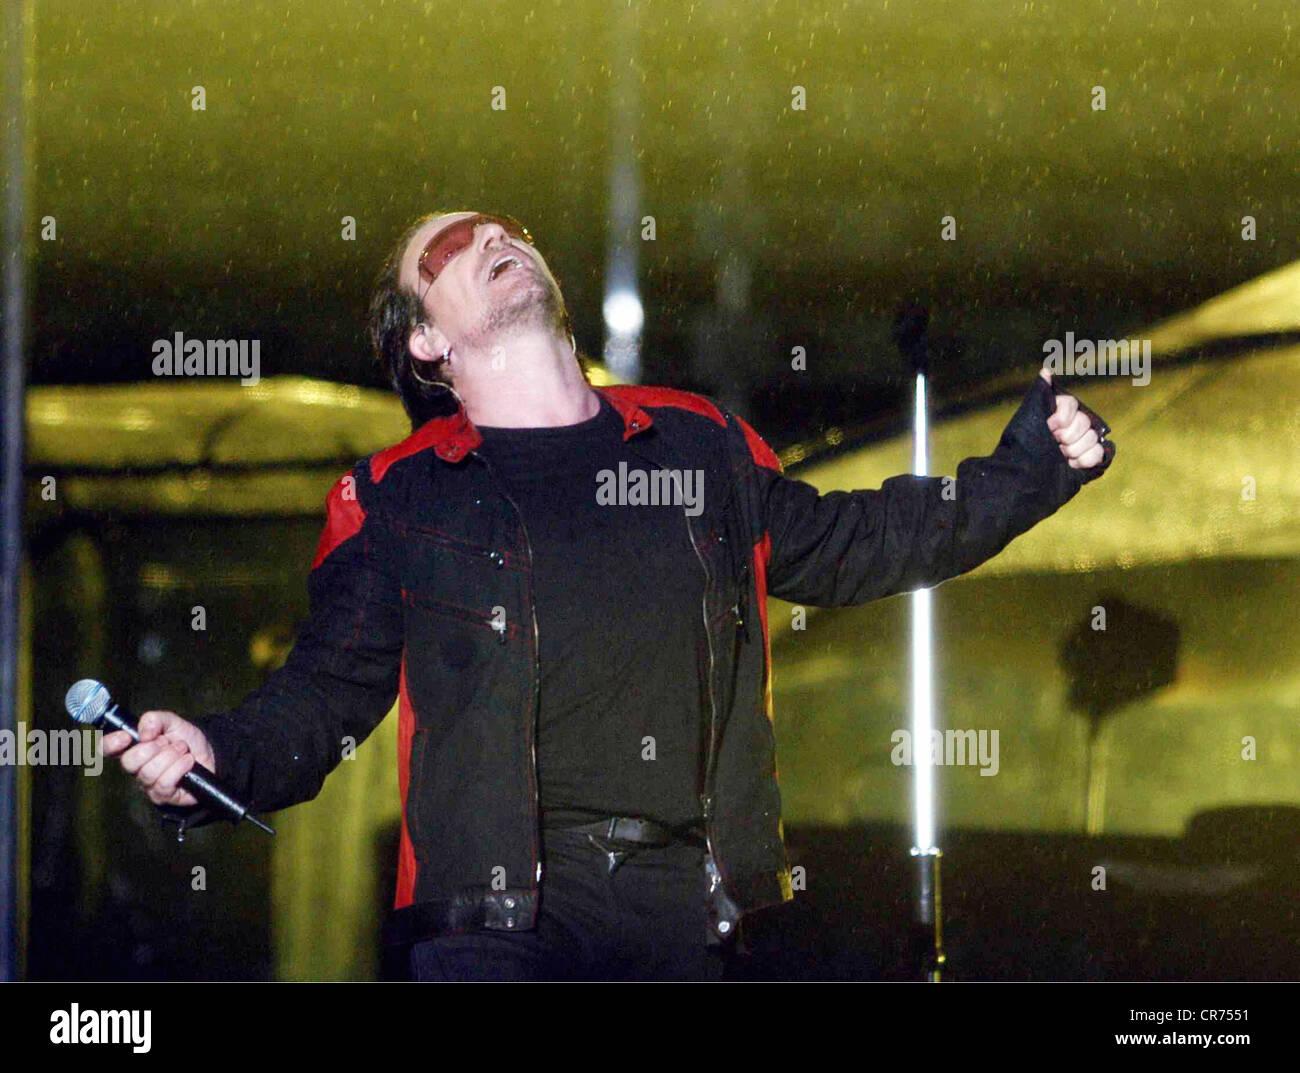 U2, Irish rock band, frontman Bono Vox is singing in the rain, half length, Olympic stadium, Munich, Germany, 2.8.2005, - Stock Image